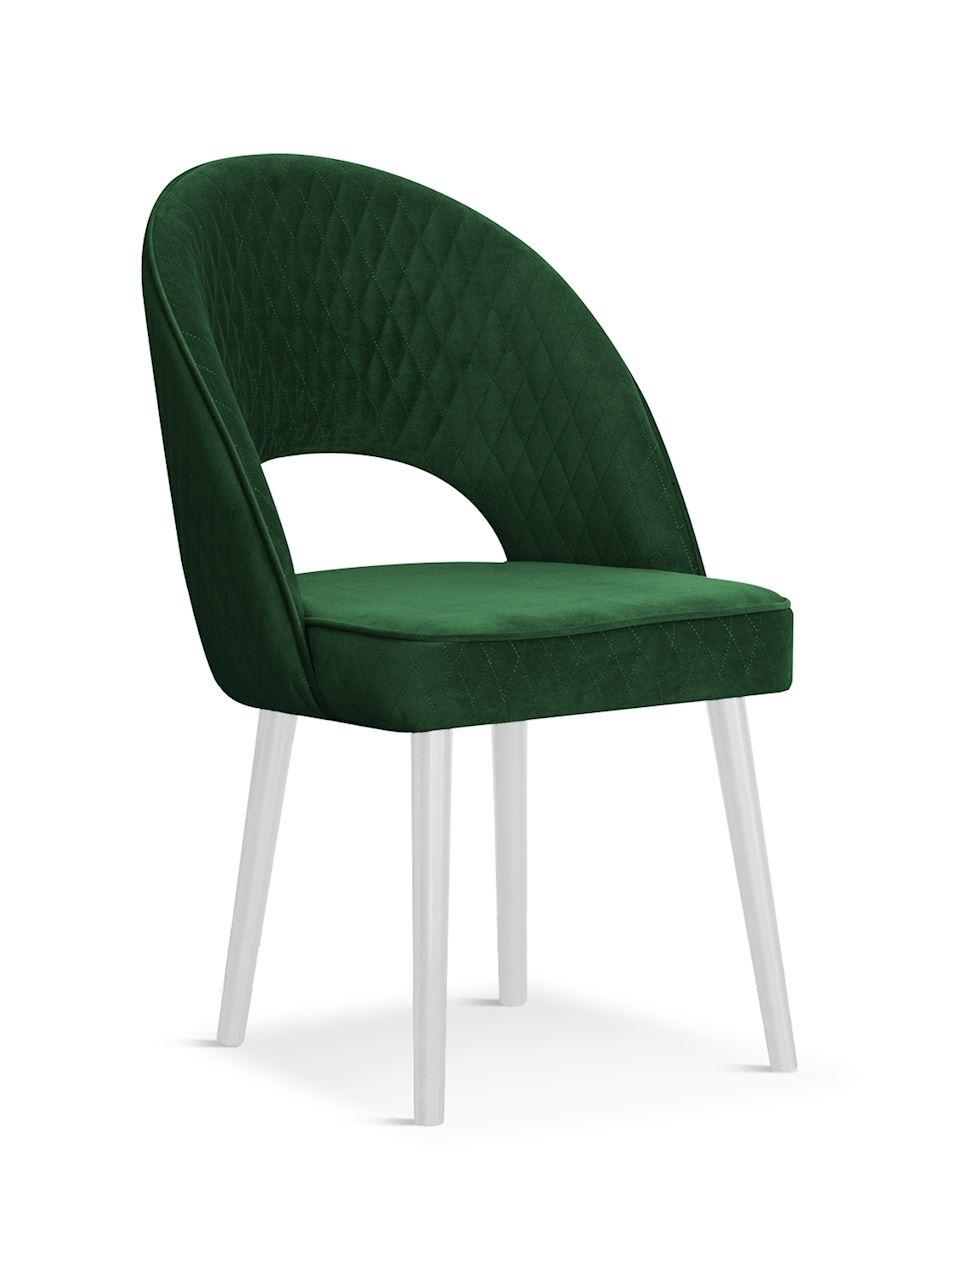 Scaun tapitat cu stofa, cu picioare din lemn Ponte Green / White, l56xA63xH89 cm